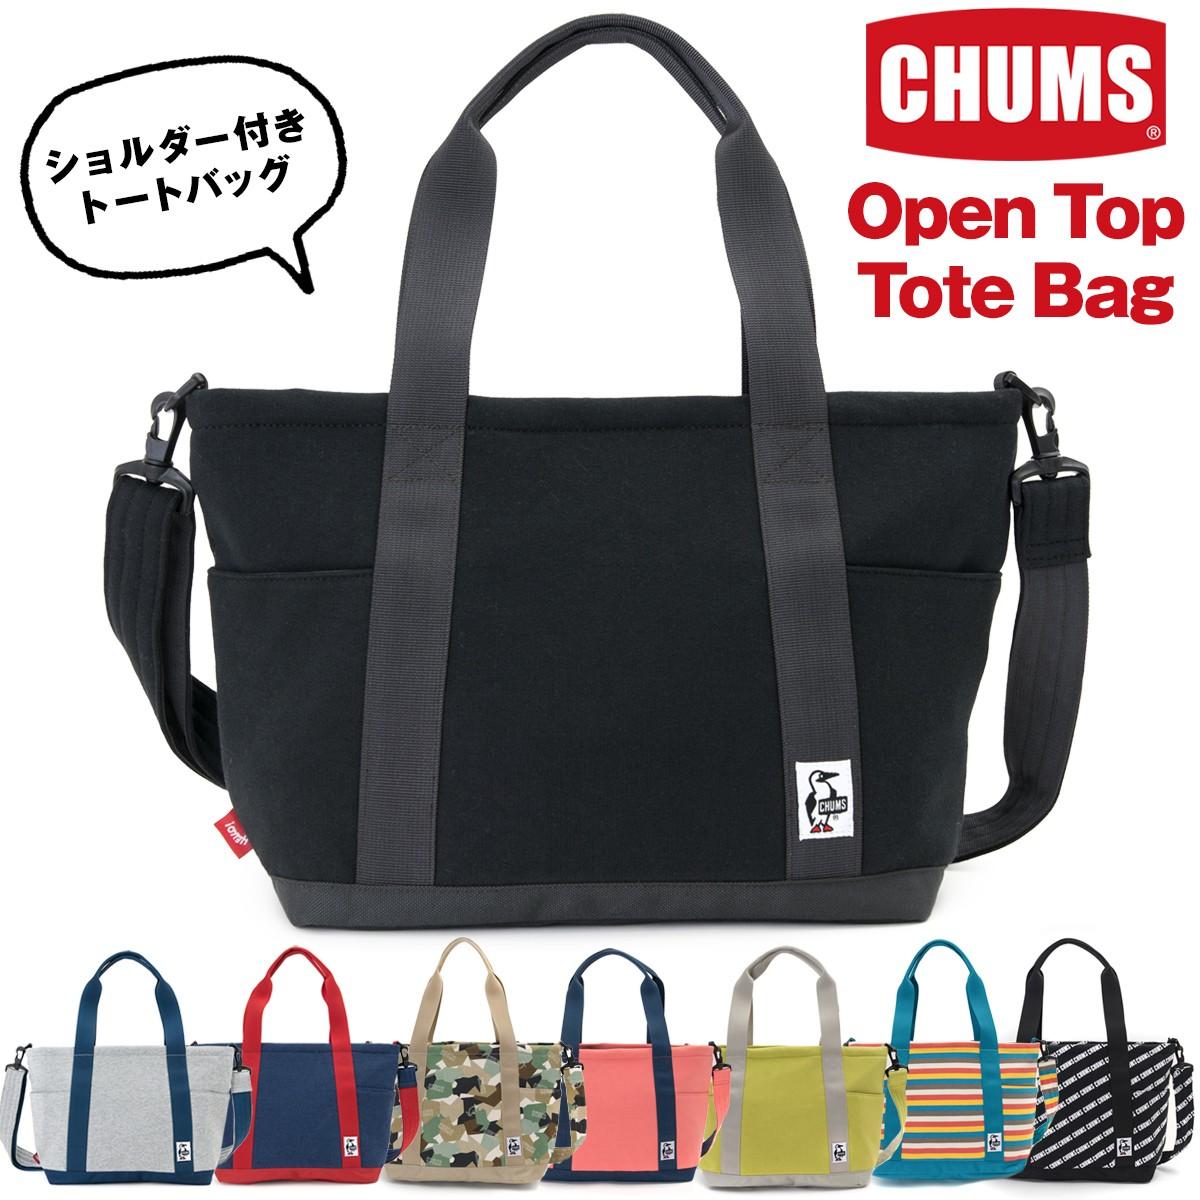 CHUMS チャムス Open Top Tote Bag